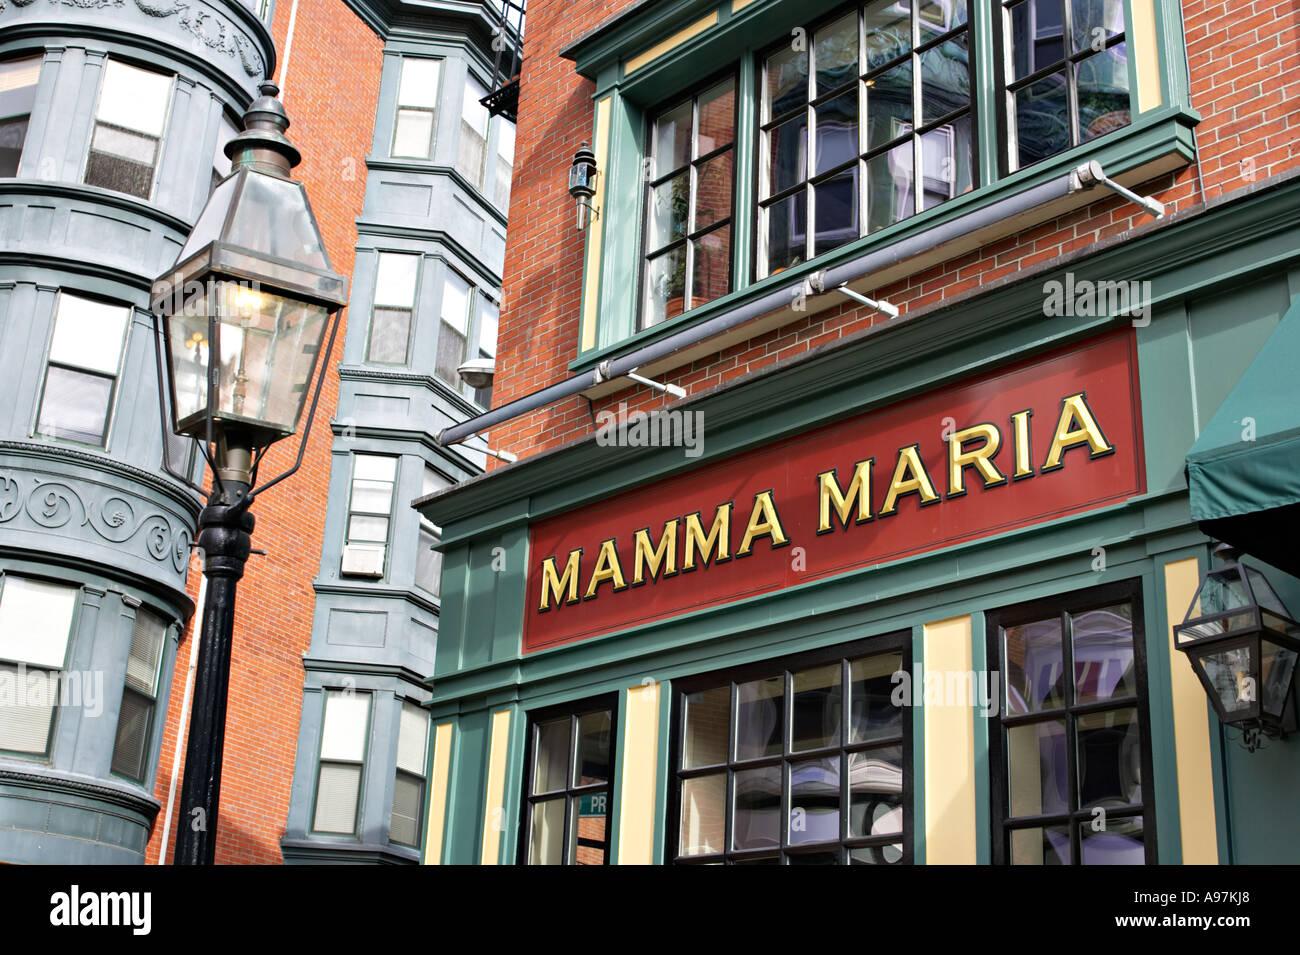 Italian restaurant exterior - Massachusetts Boston Exterior Of Mamma Maria Italian Restaurant In North End Neighborhood Street Lamp Stock